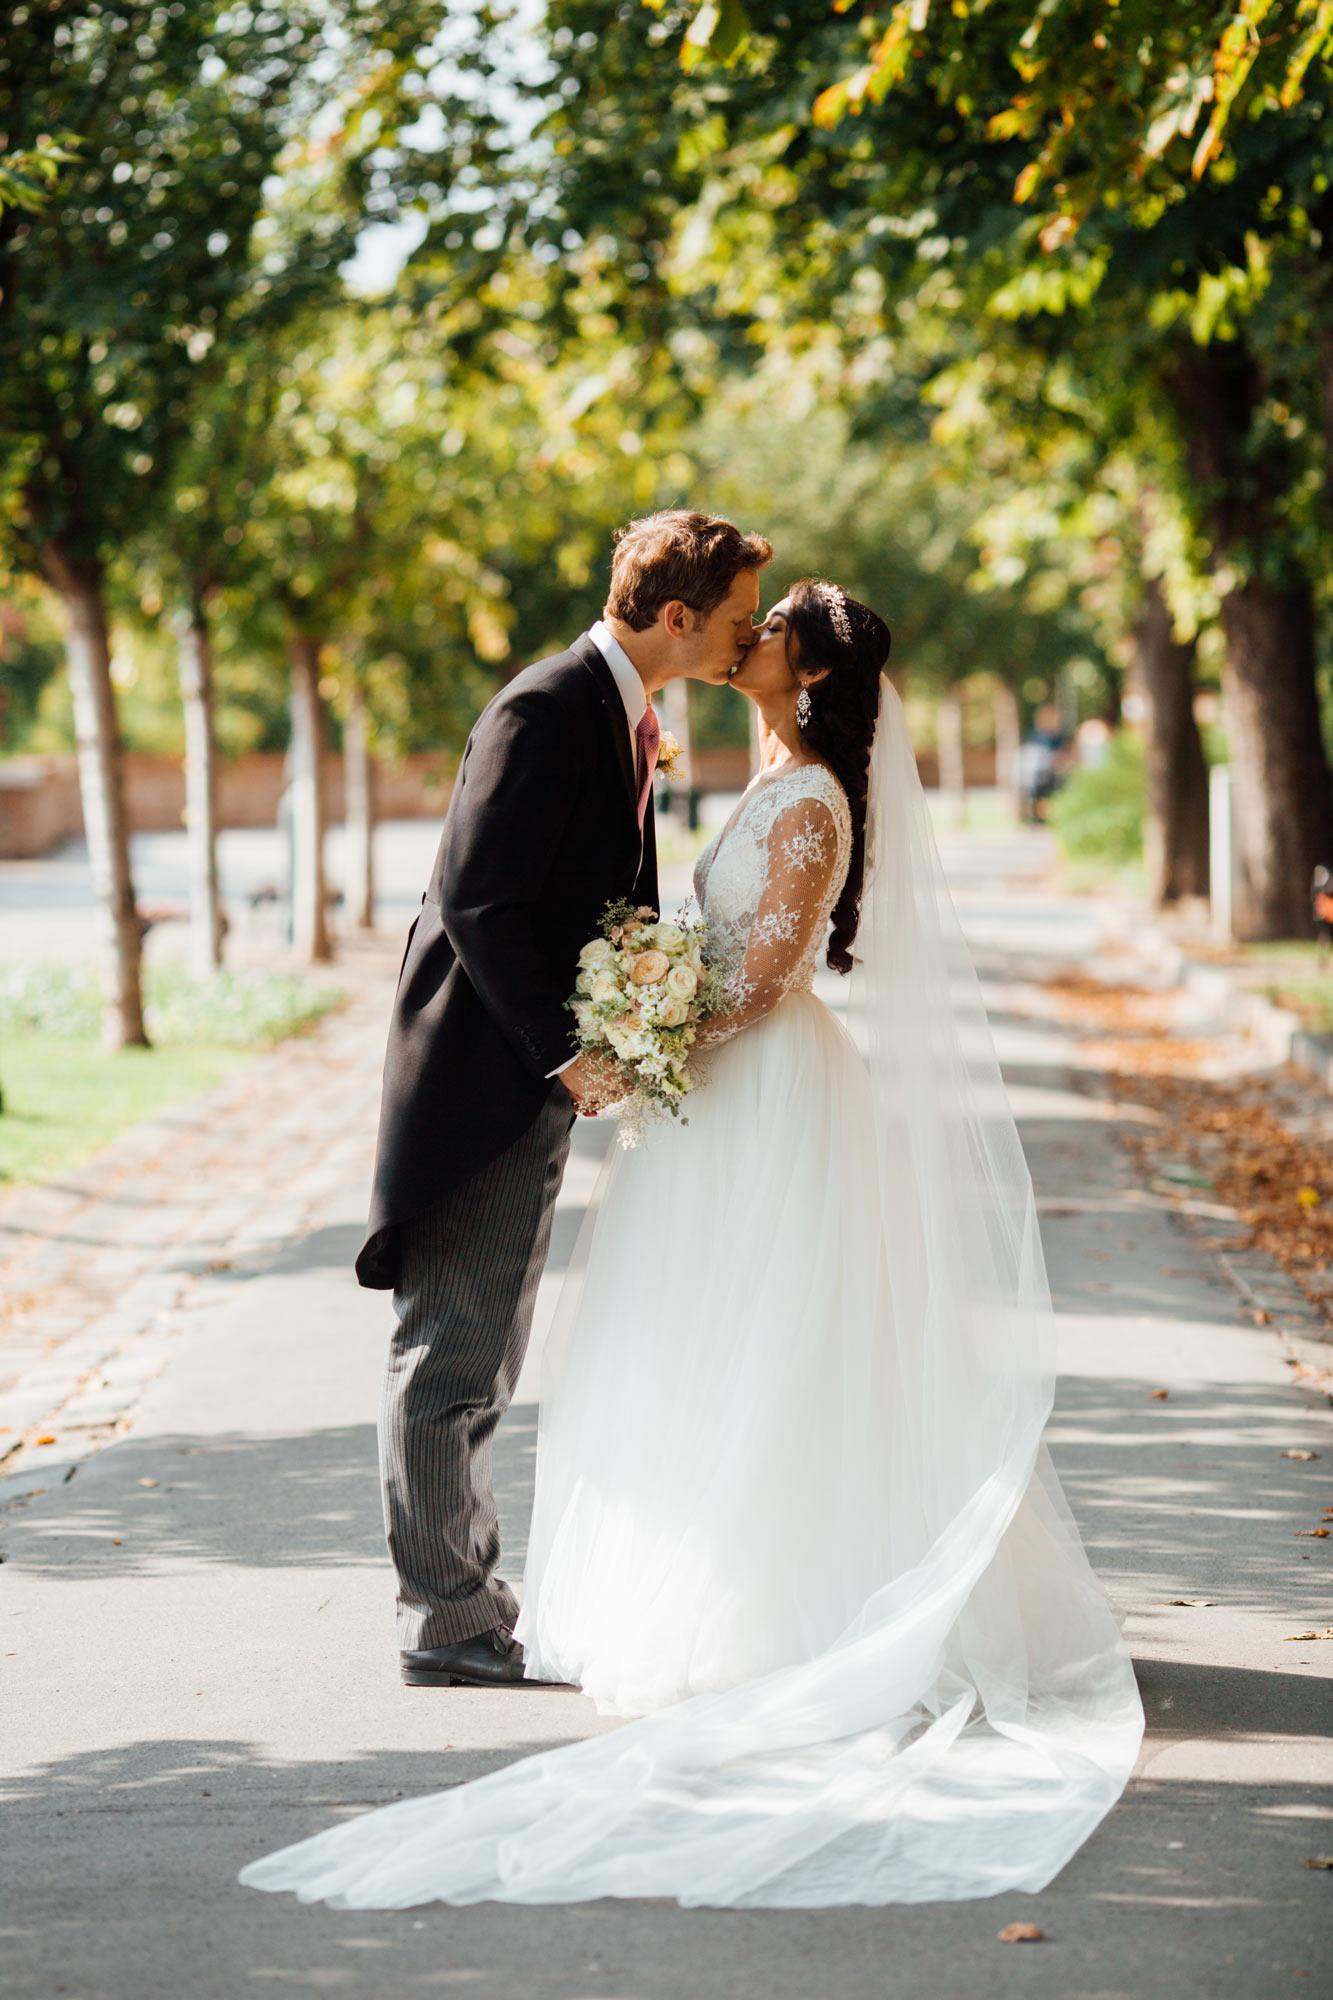 BeckyLee-wedding10.jpg